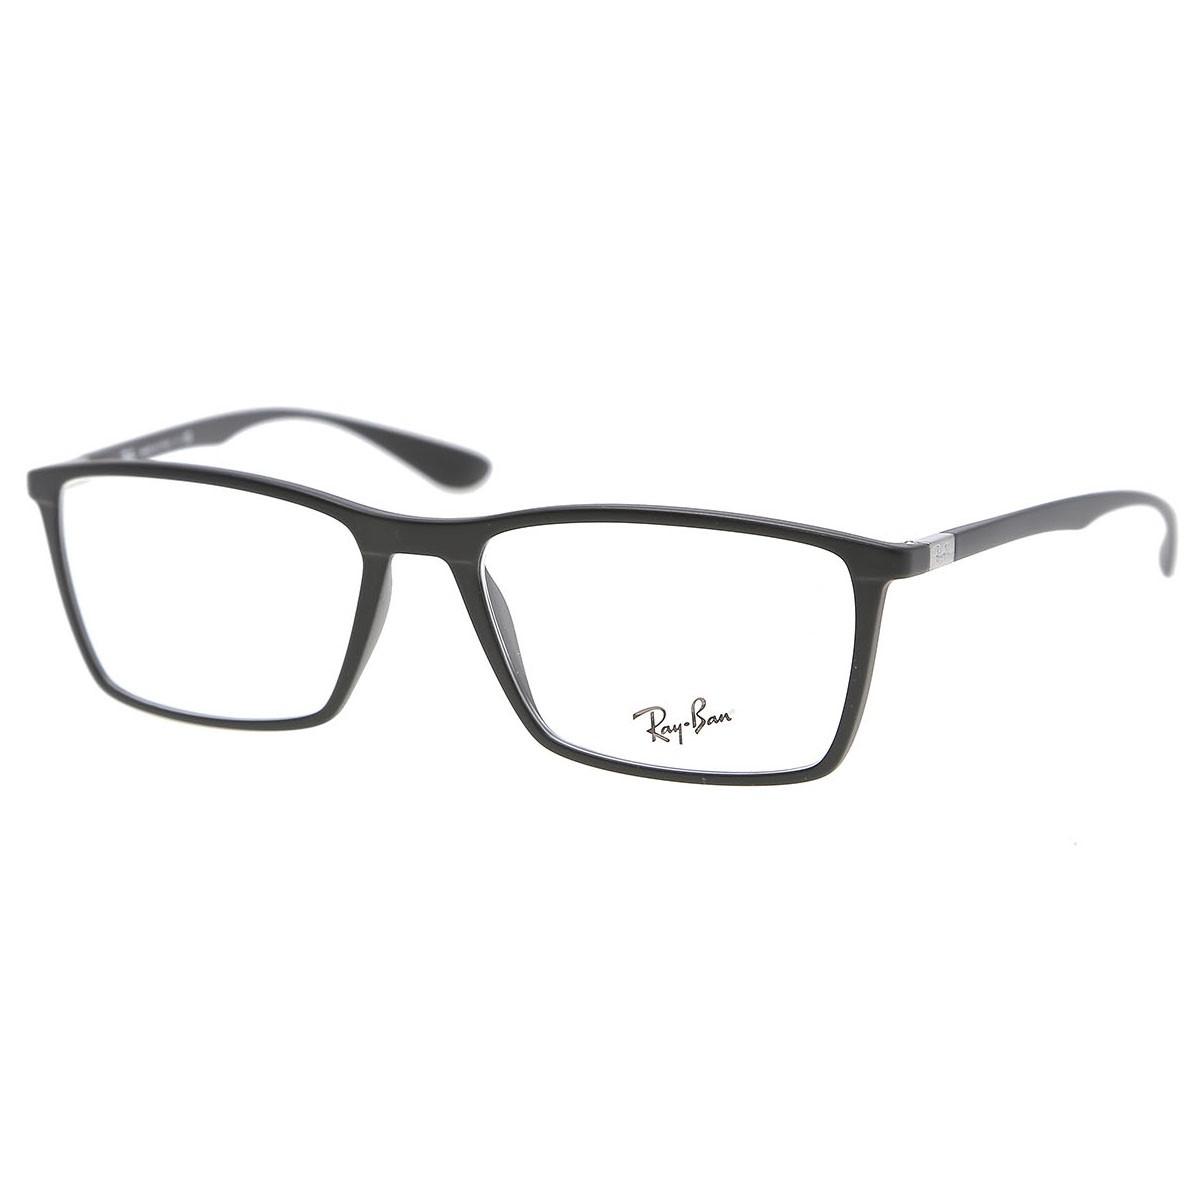 342f4bf0f Compre Óculos de Grau Ray Ban Liteforce em 10X | Tri-Jóia Shop